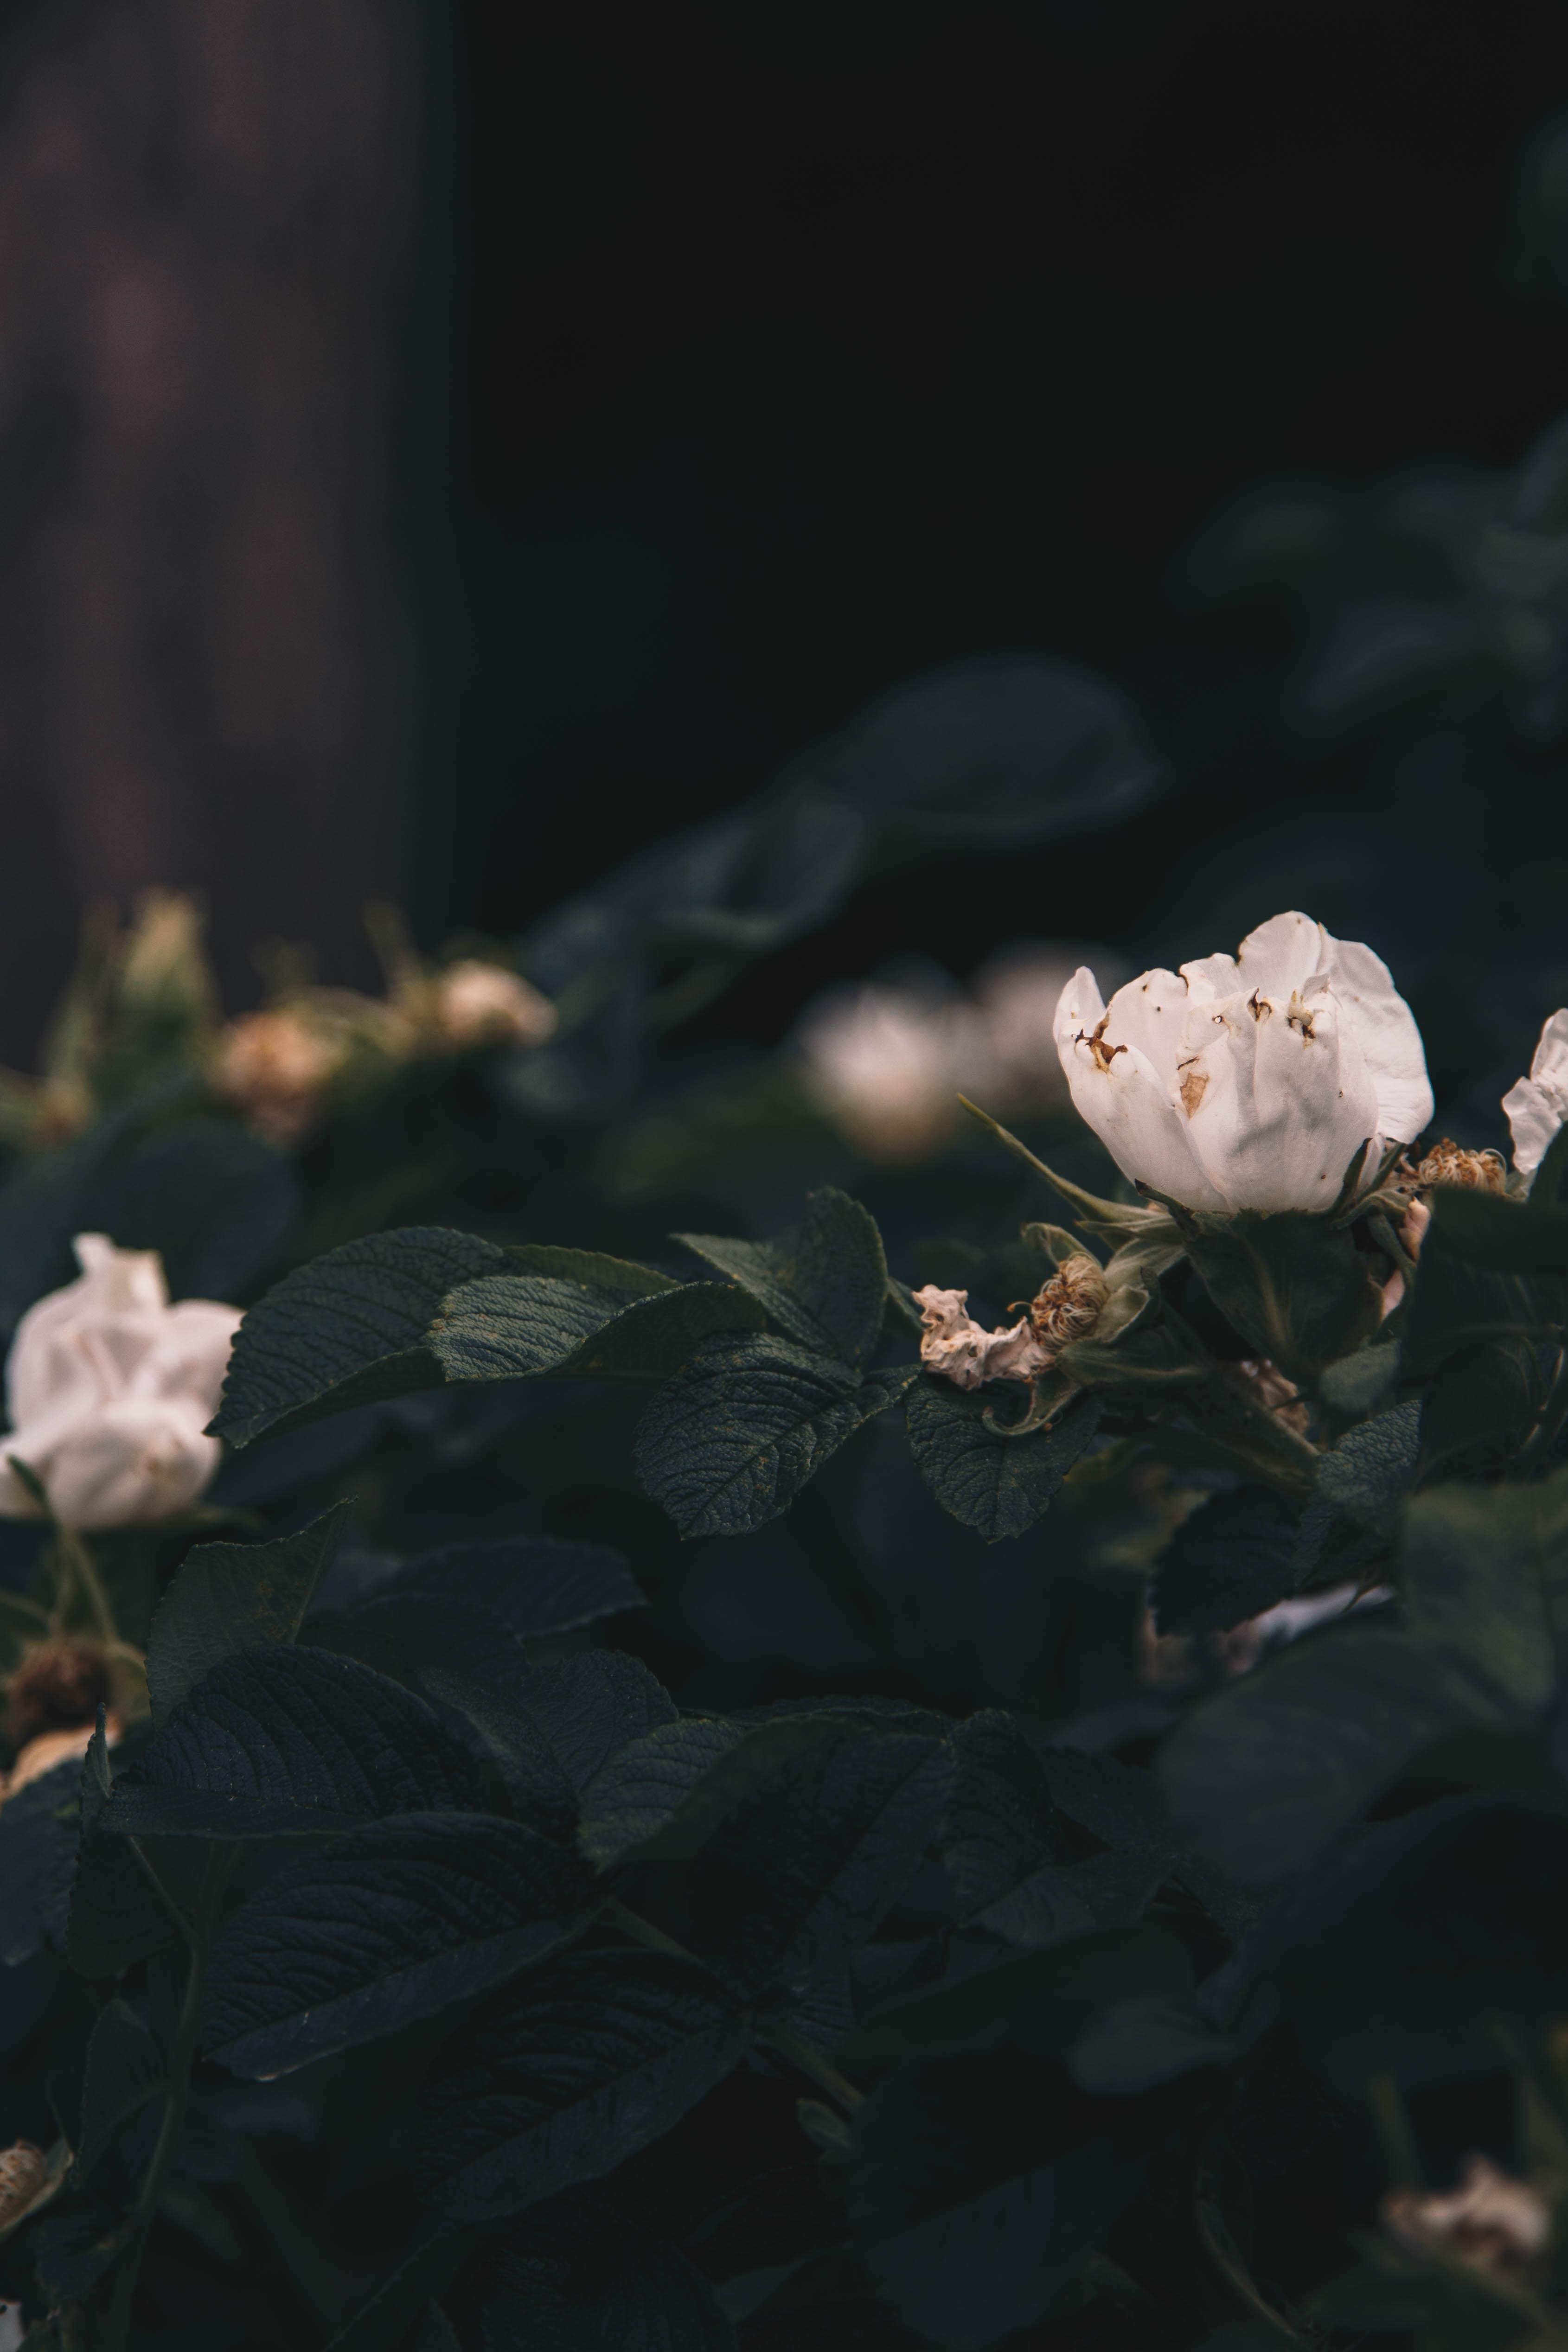 macro photography of white petaled flowers